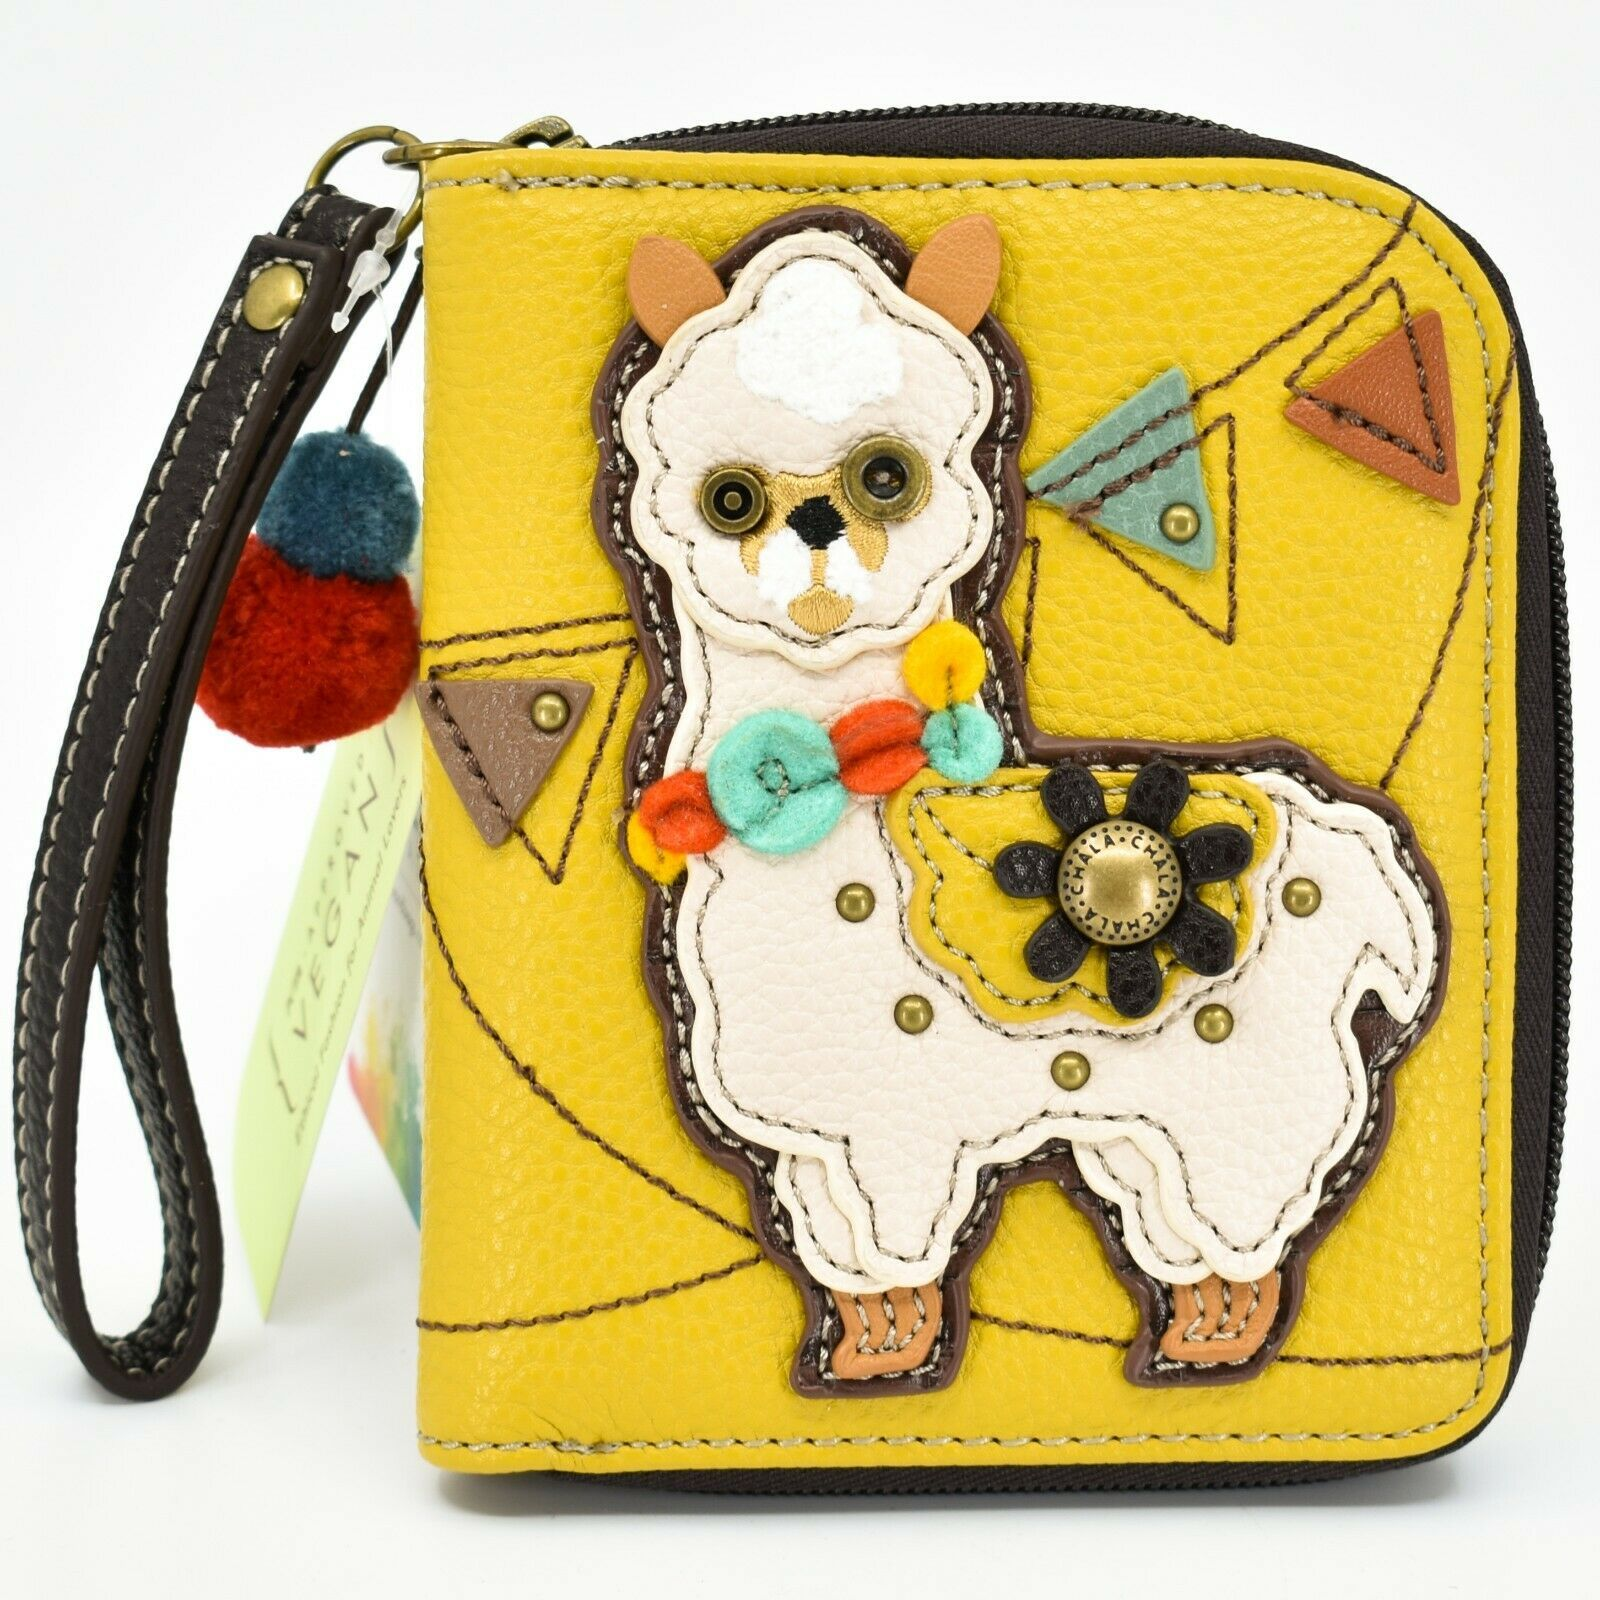 Chala Handbags Faux Leather Whimsical Llama Yellow Zip Around Wristlet Wallet